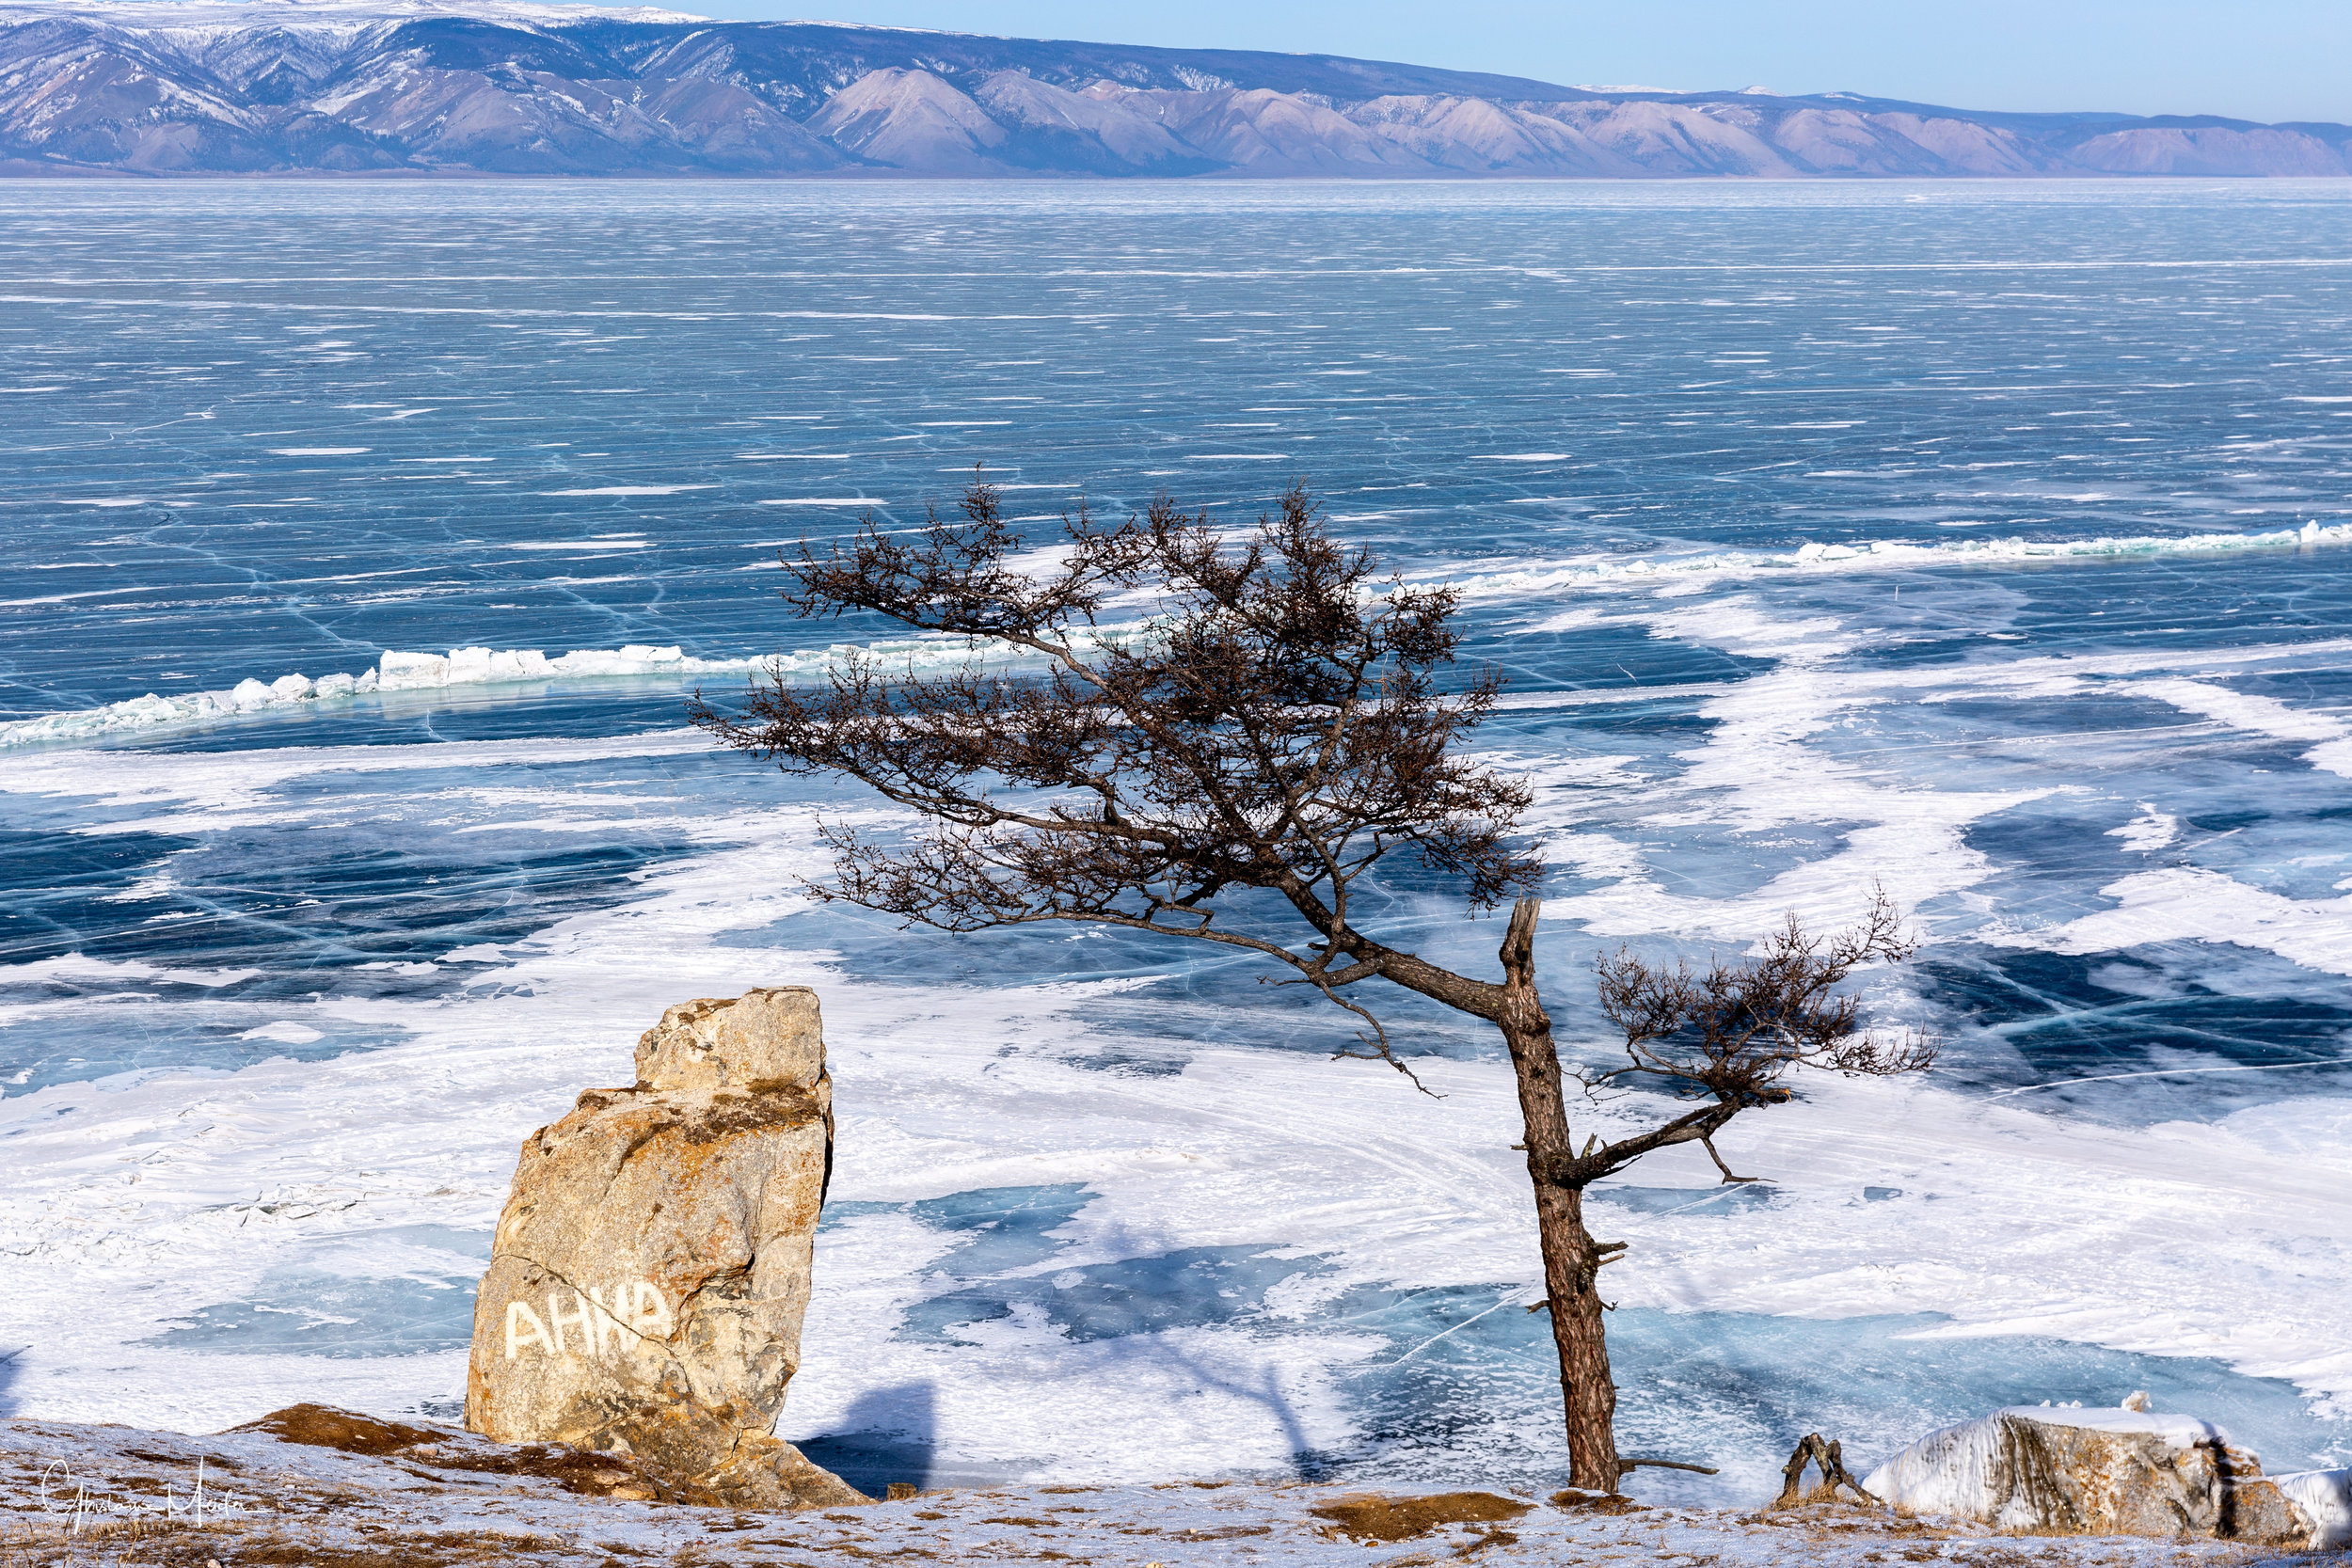 Baikal-65601-Modifier.jpg